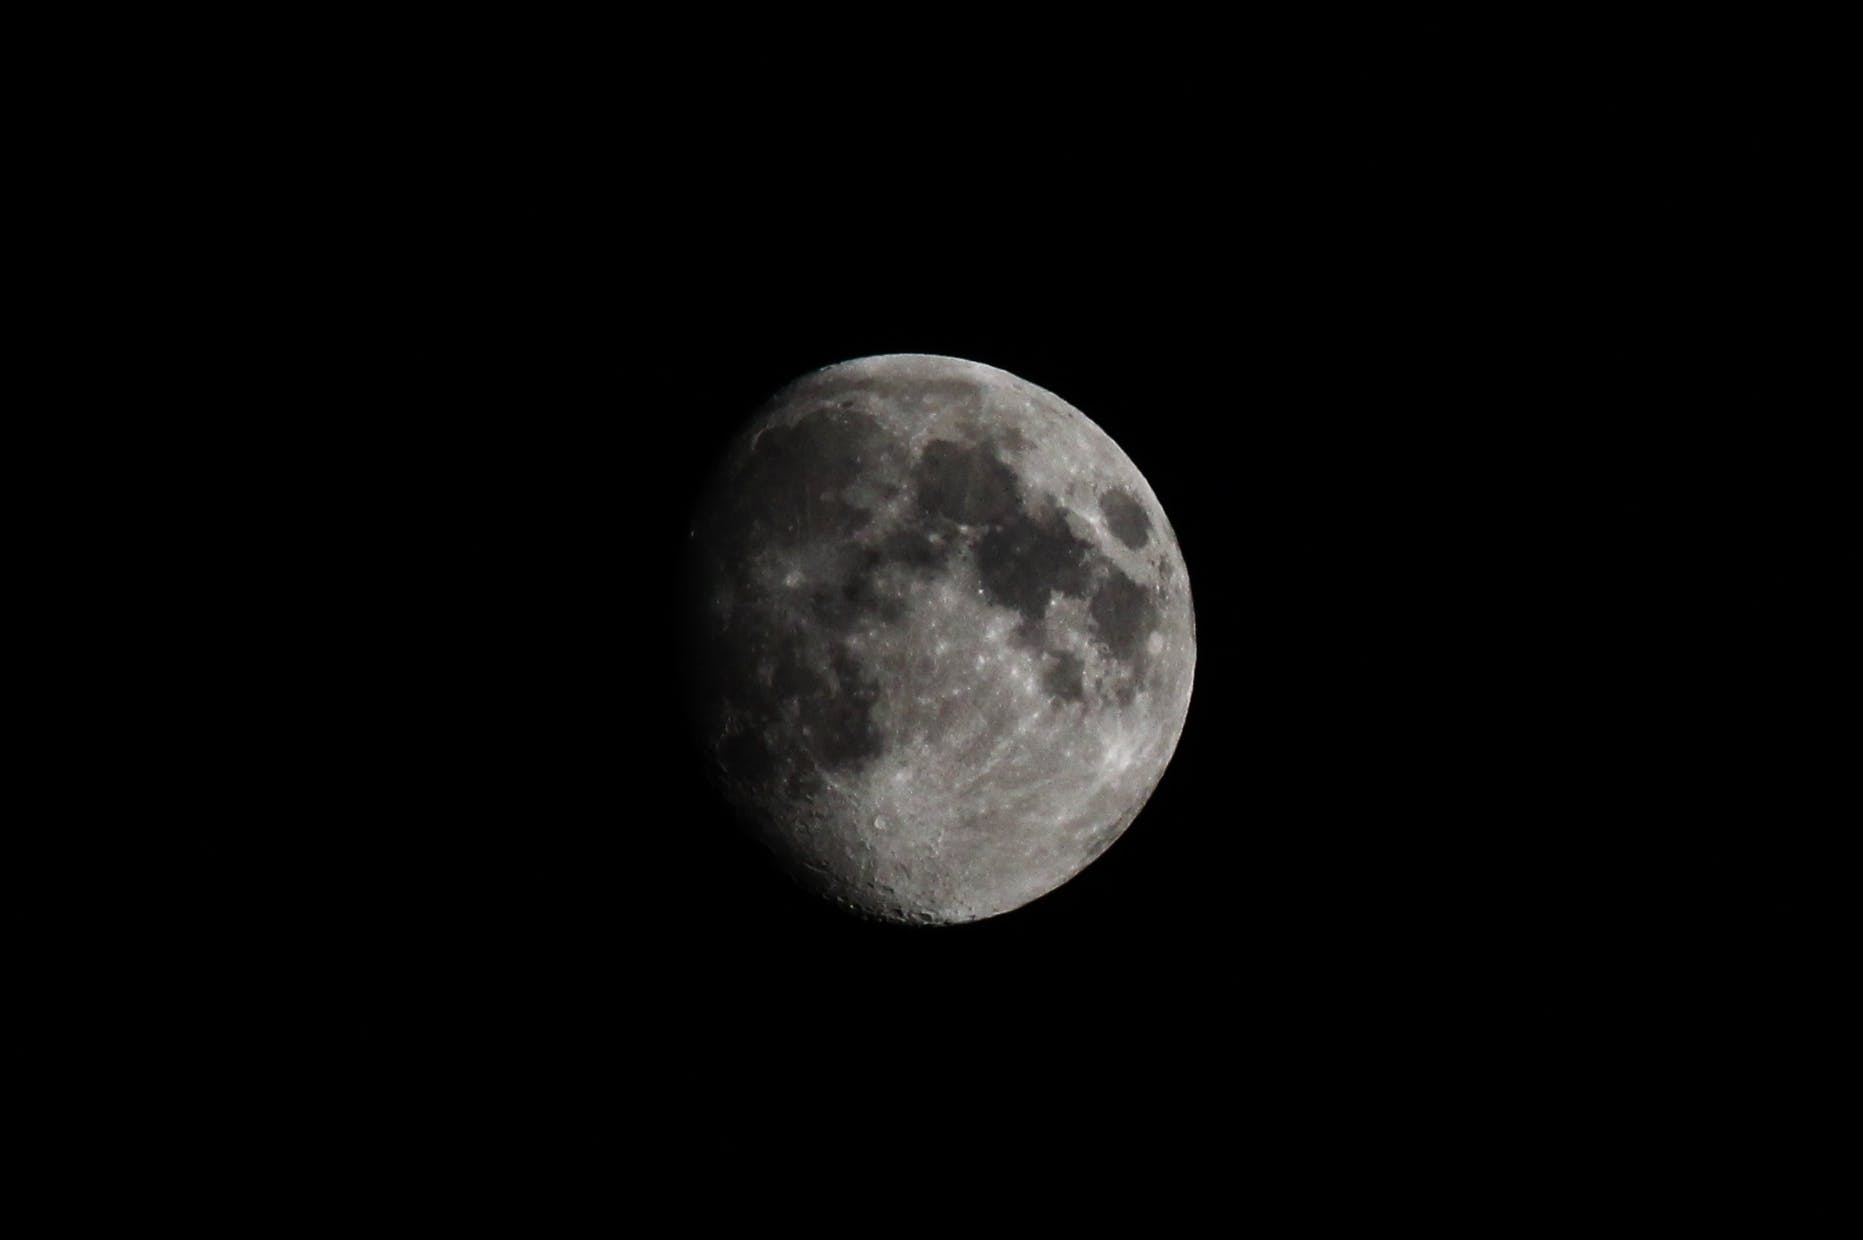 Free stock photo of night, dark, grey, black